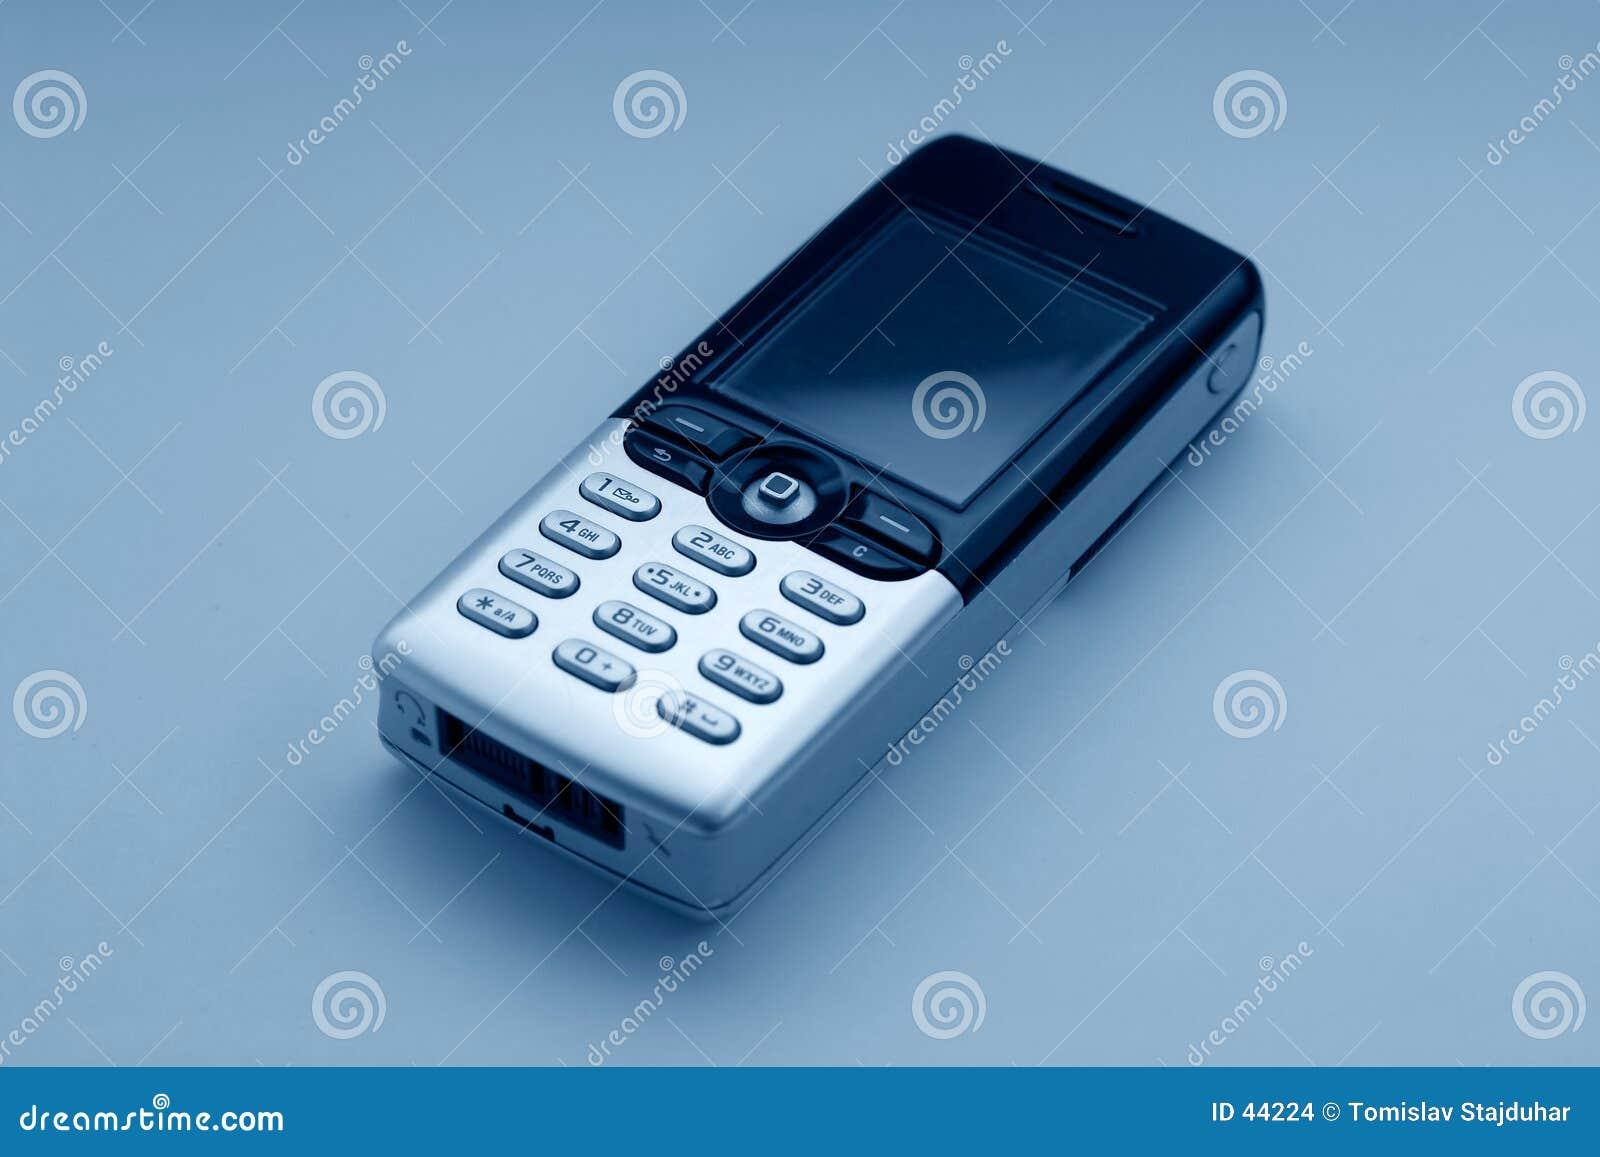 Teléfono móvil - tono azul